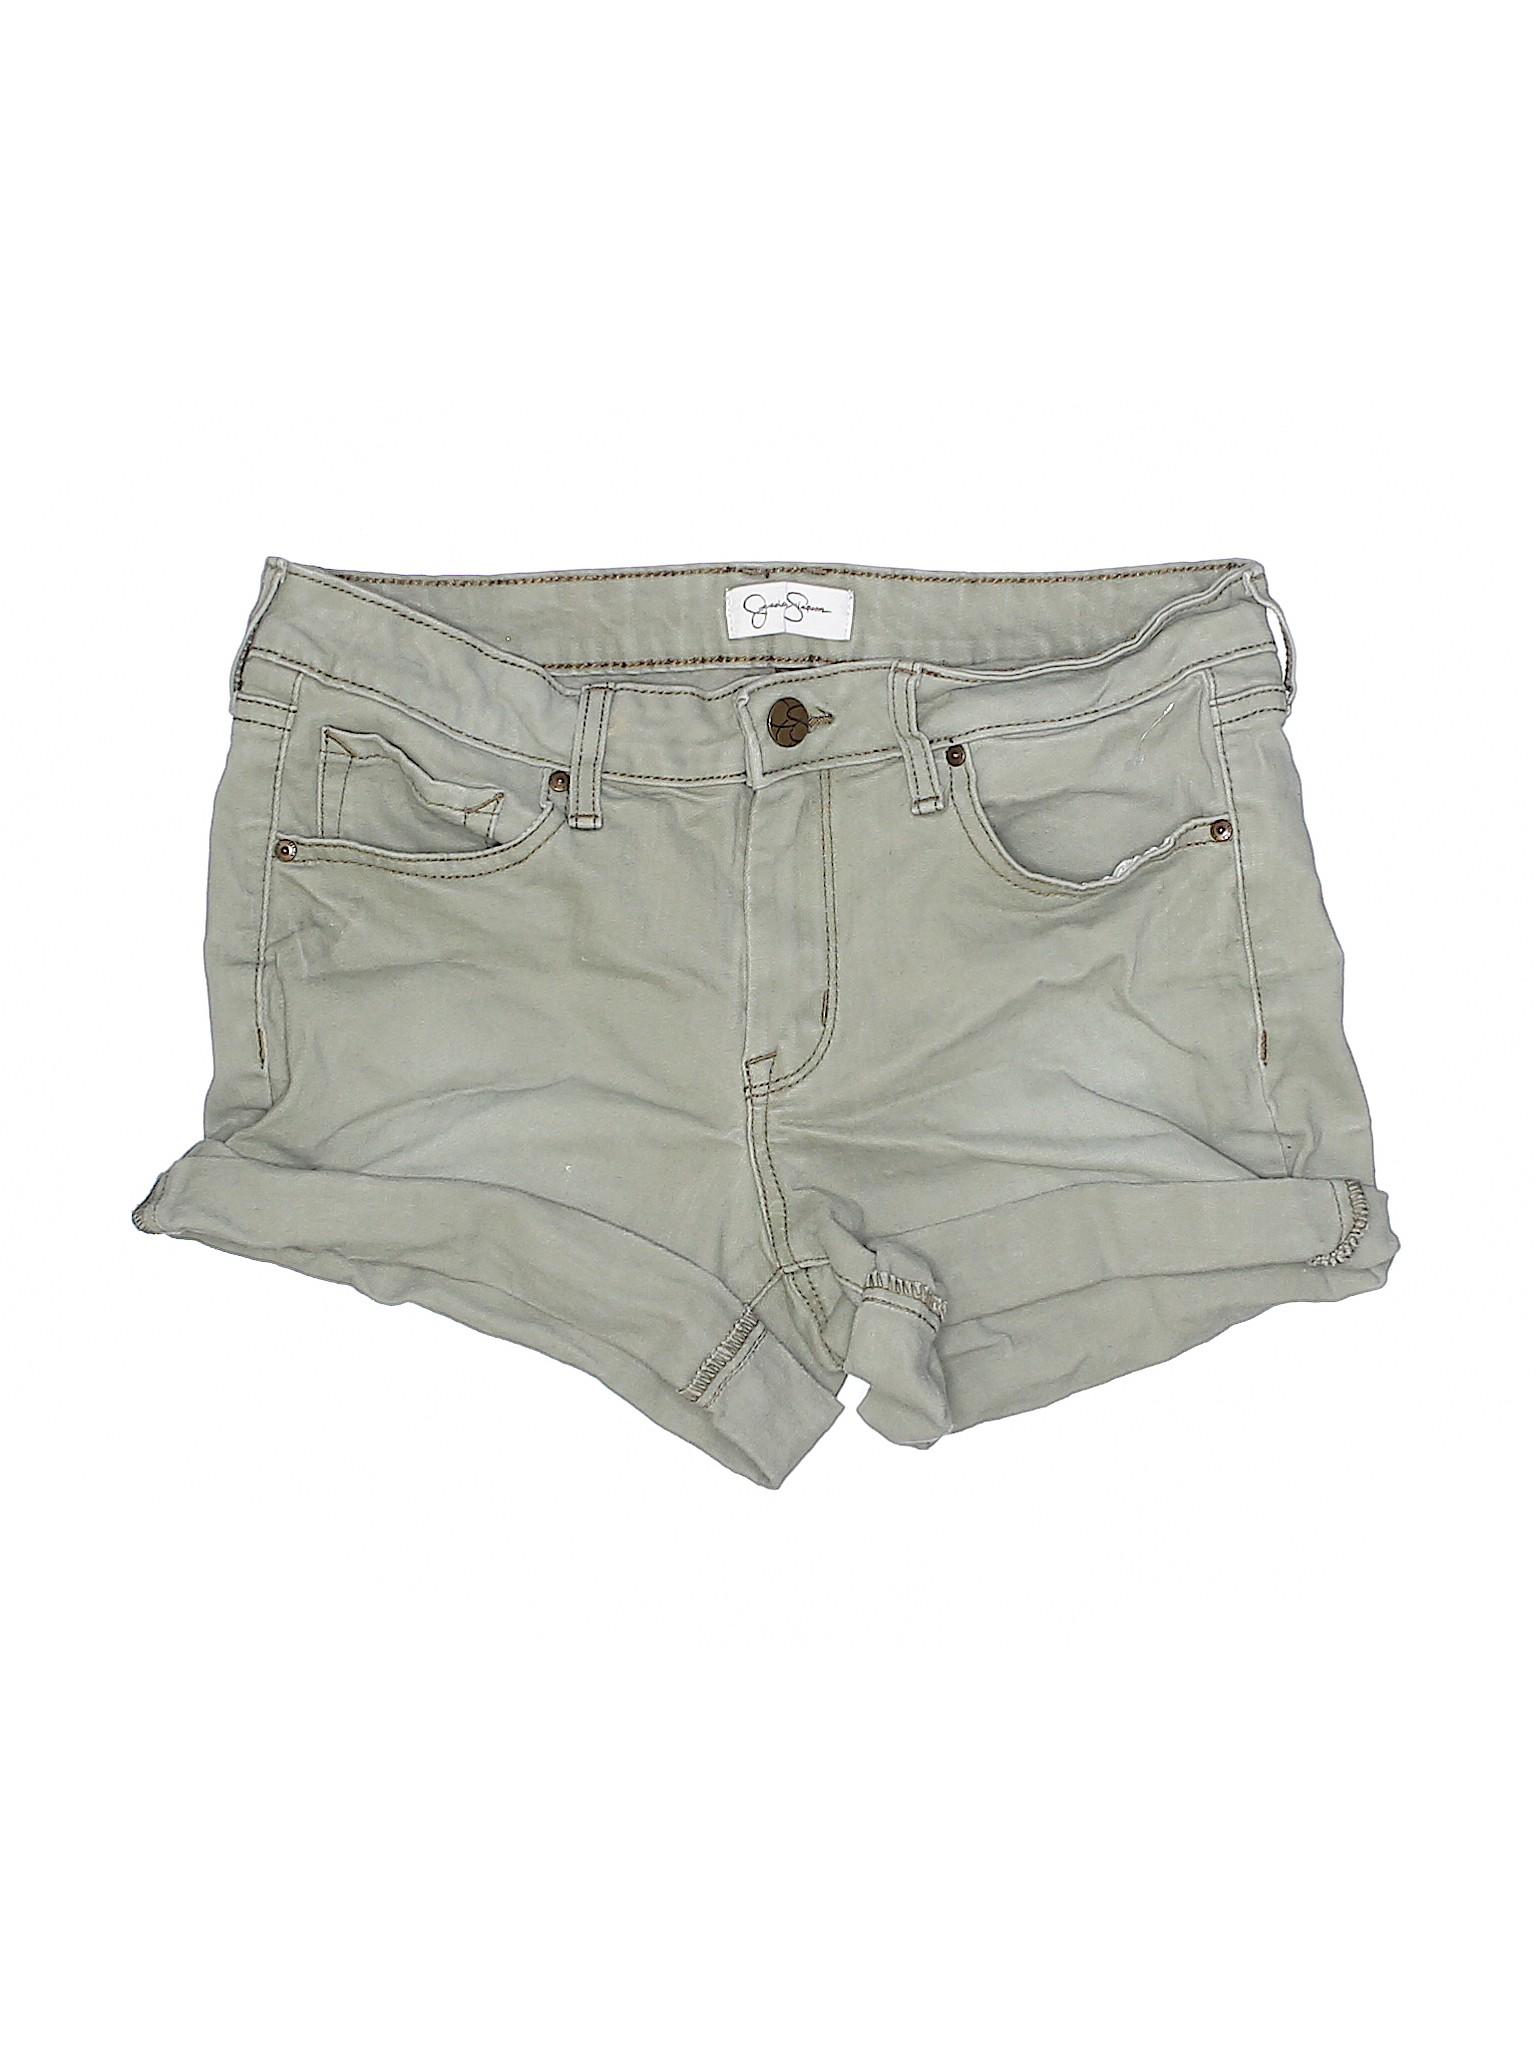 Boutique Jessica Simpson Denim Boutique Shorts Jessica rFHwCqrxO8